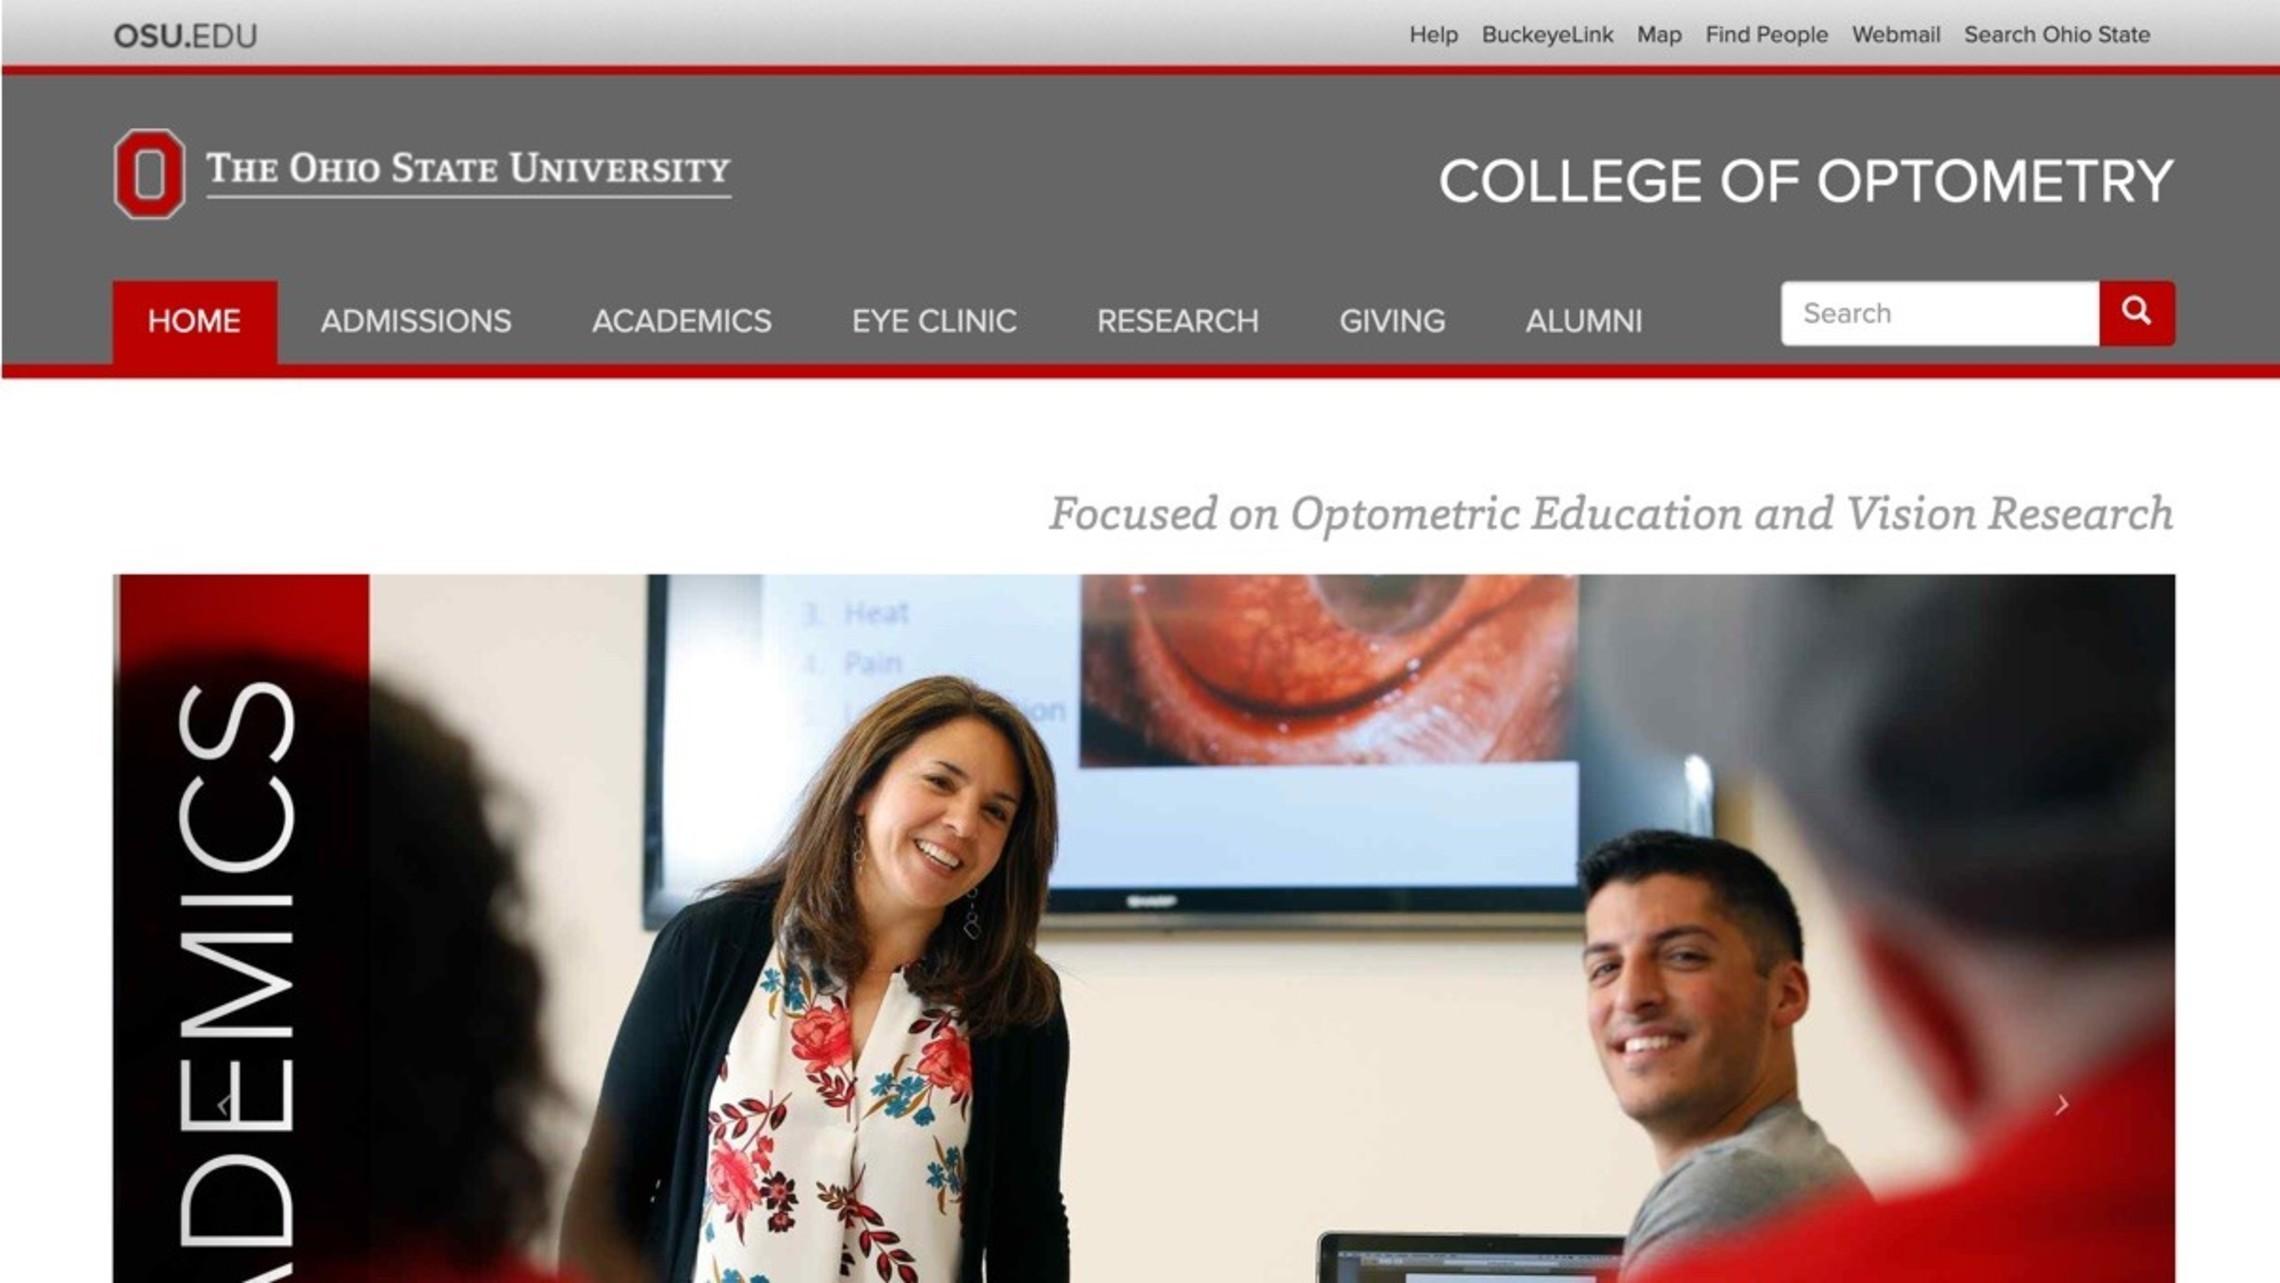 OSU - College of Optometry